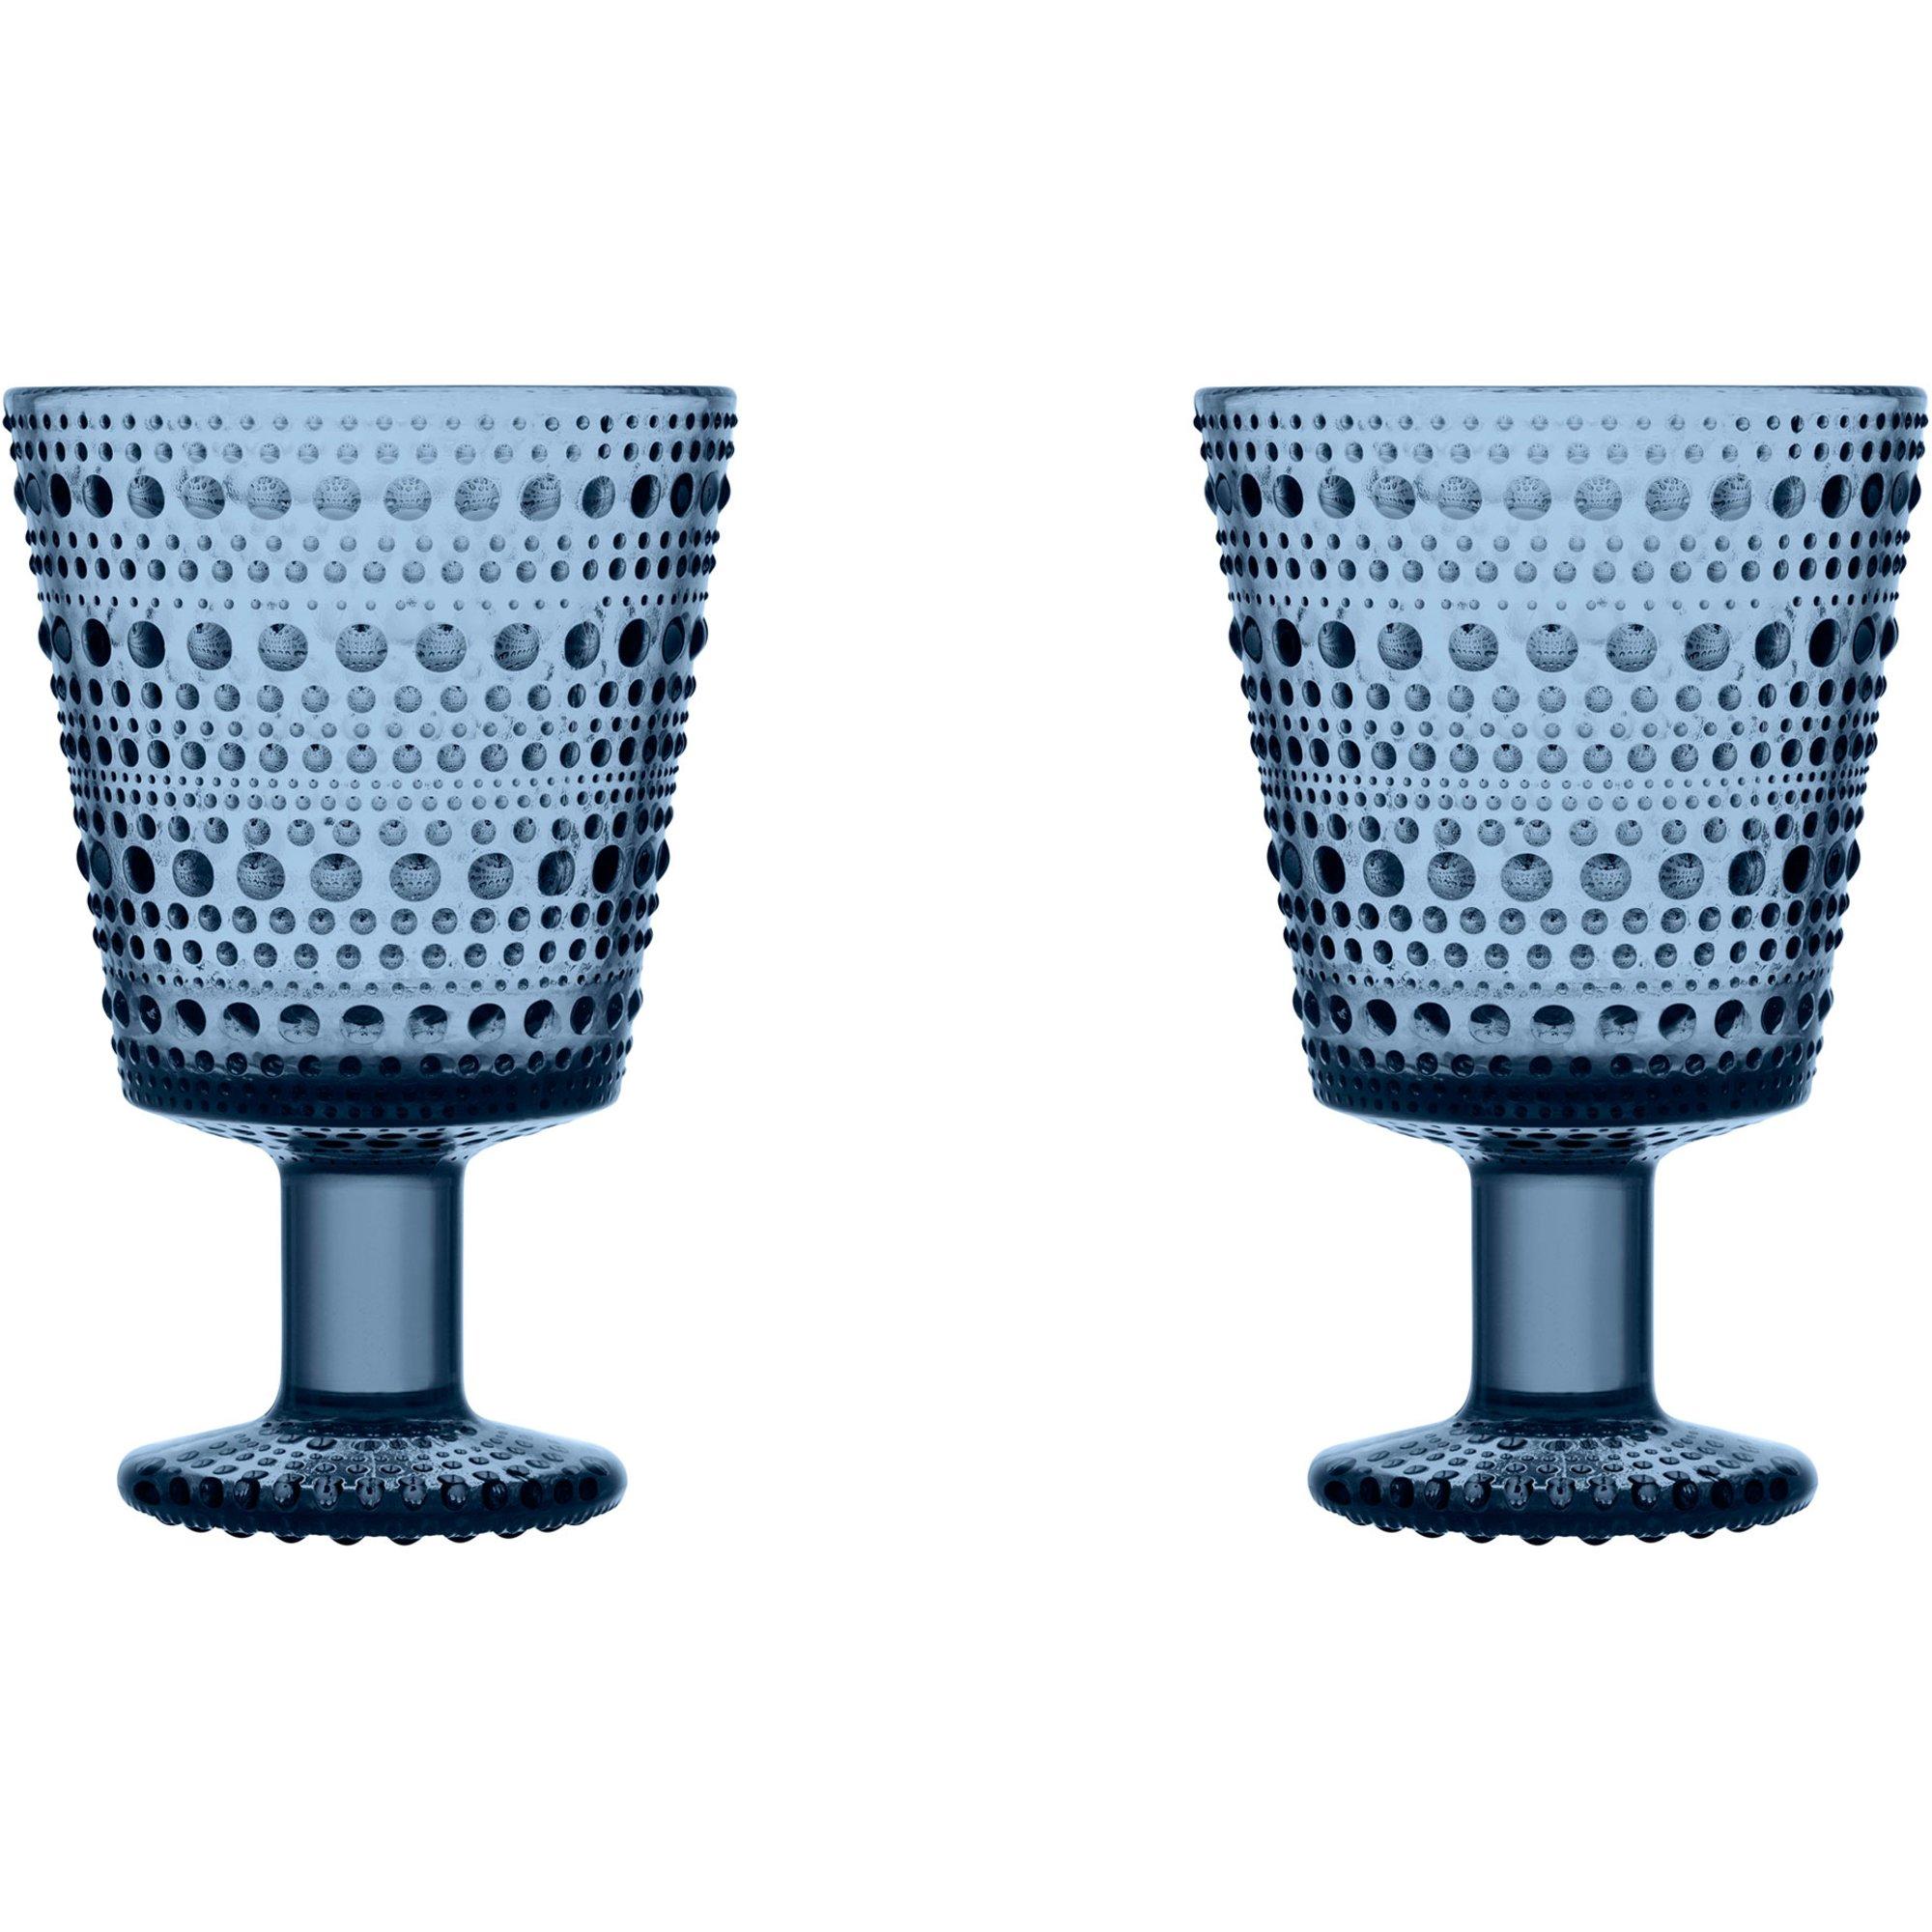 Iittala Kastehelmi Glas på fot 2 st. Regn